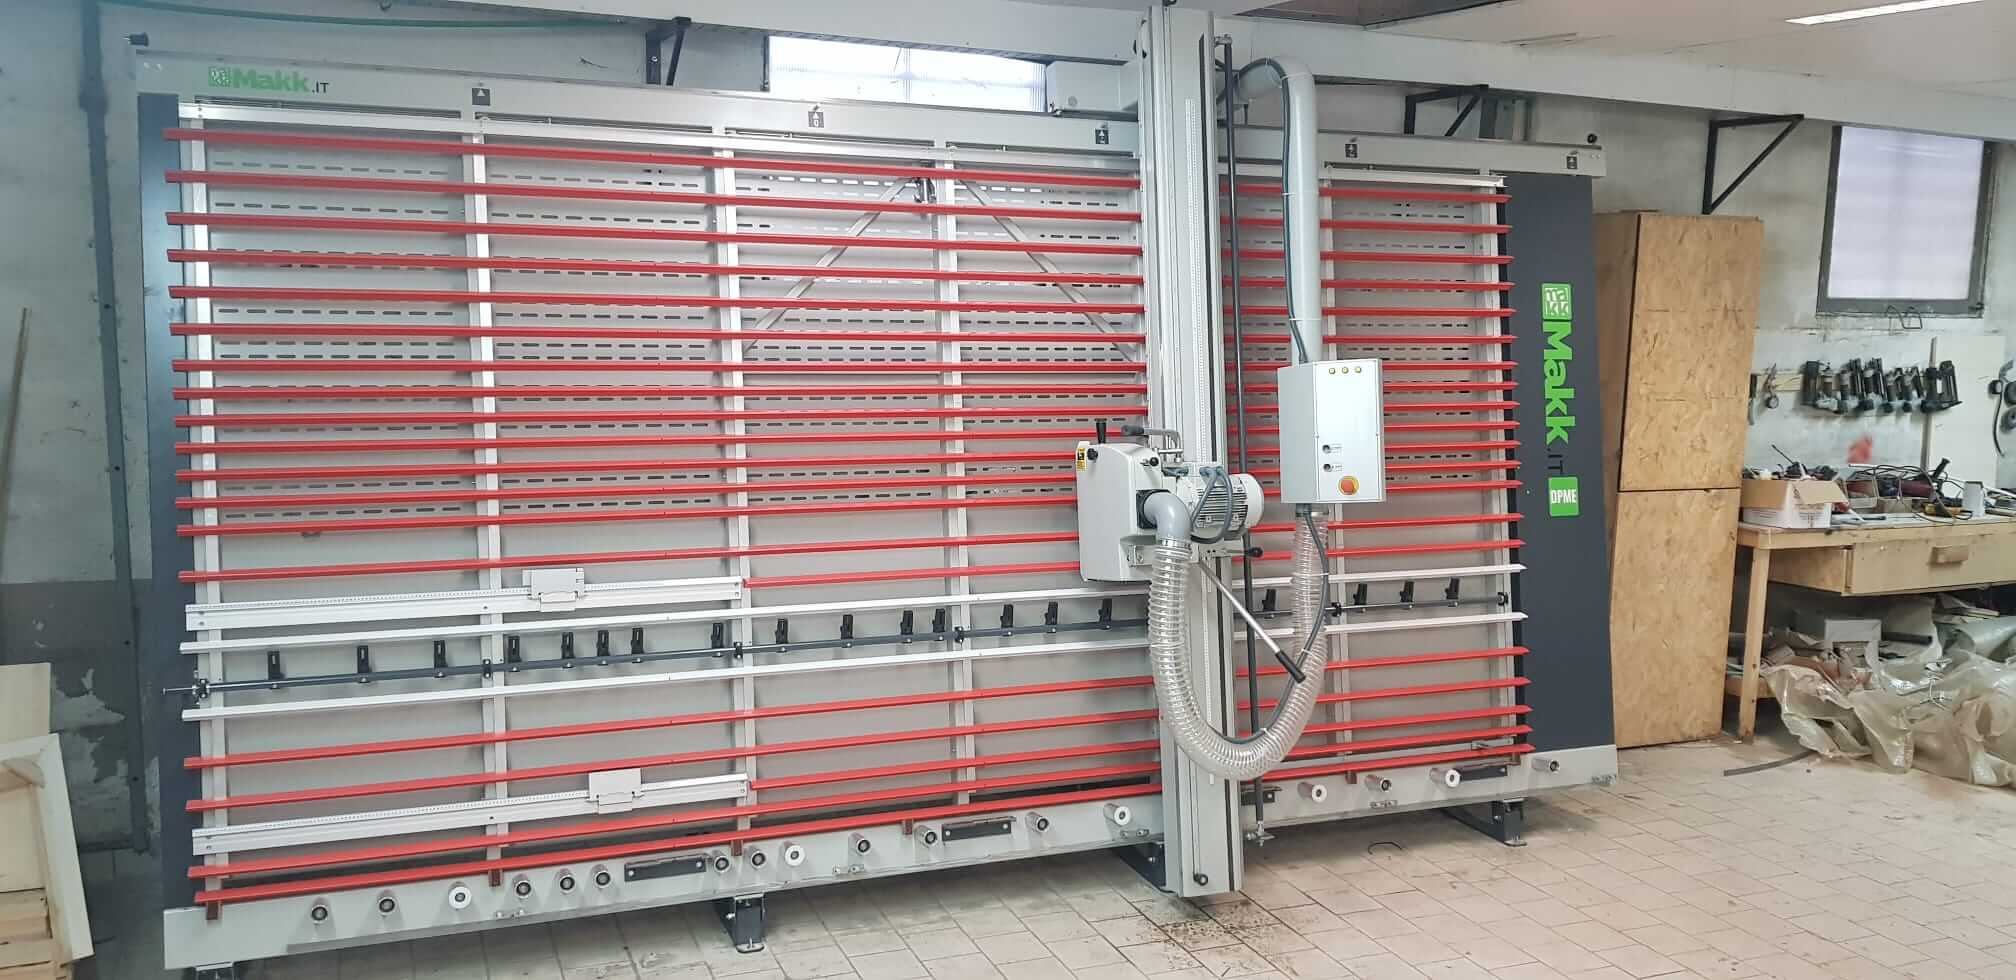 Sezionatrice verticale MAKK DPME per ditta MAIONE SRL - Caserta